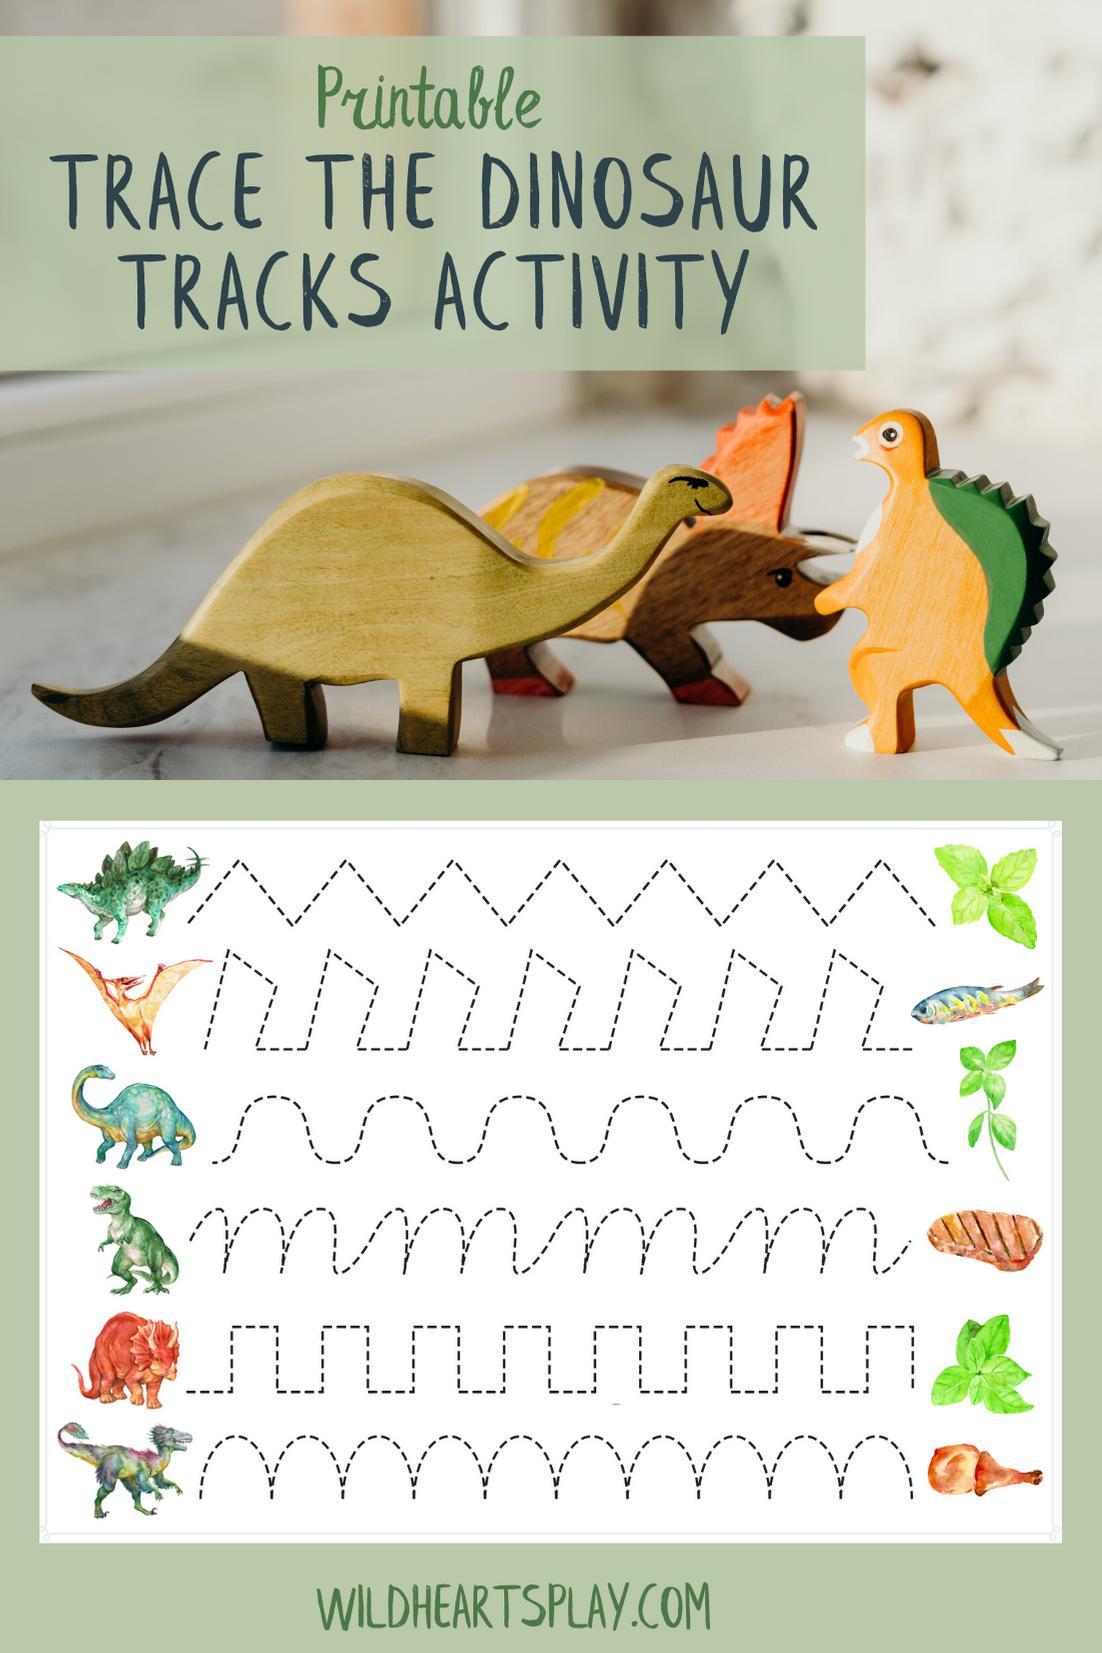 Printable Trace The Dinosaur Tracks Worksheet